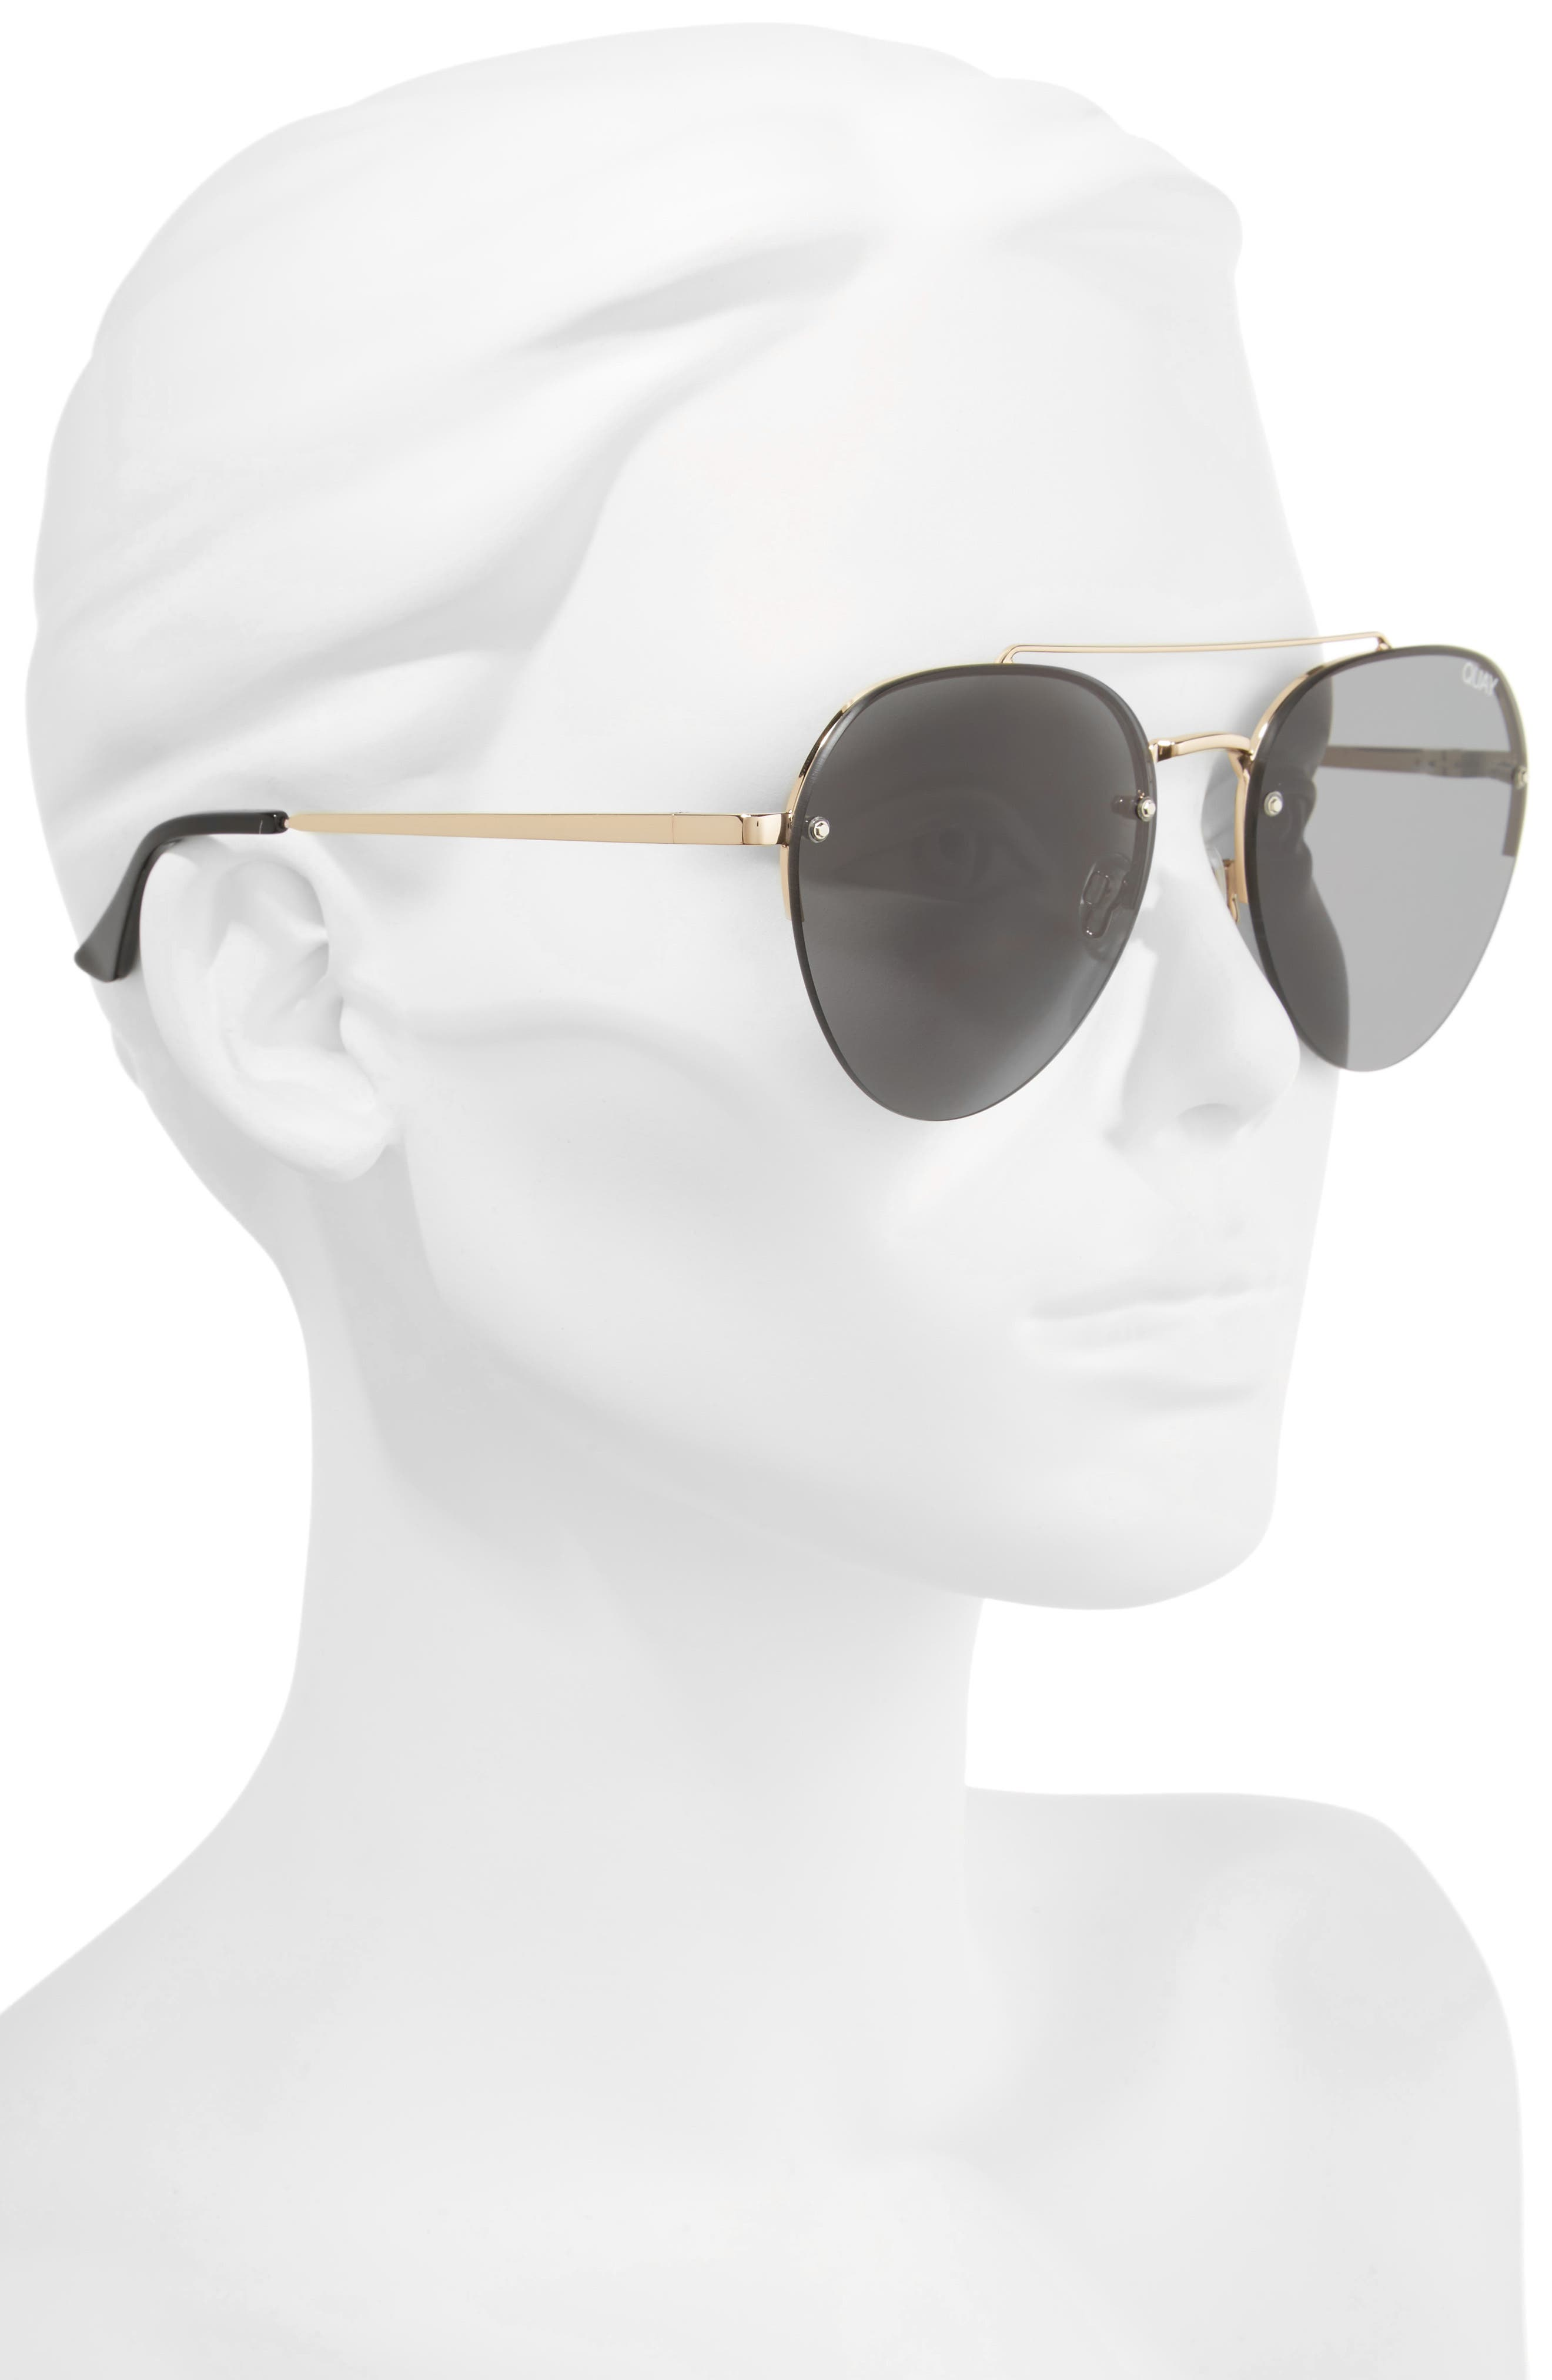 Somerset 65mm Aviator Sunglasses,                             Alternate thumbnail 2, color,                             GOLD/ SMOKE